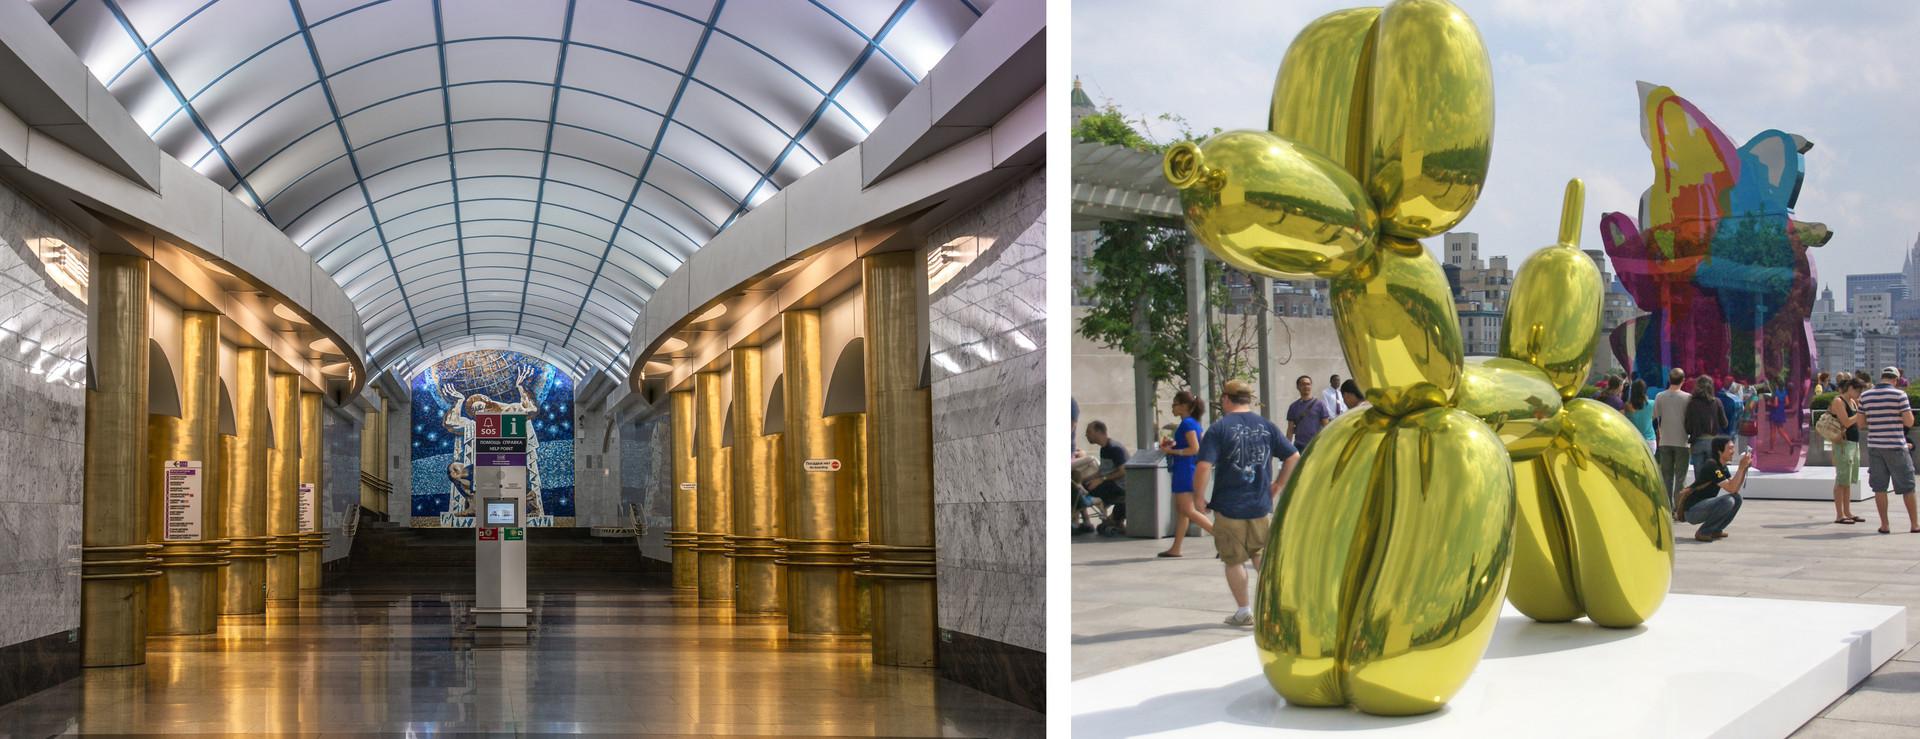 Tiang-tiang emas di Stasiun Mezhdunarodnaya mengingatkan warga setempat pada balon anjing karya seniman Amerika Jeff Koons.